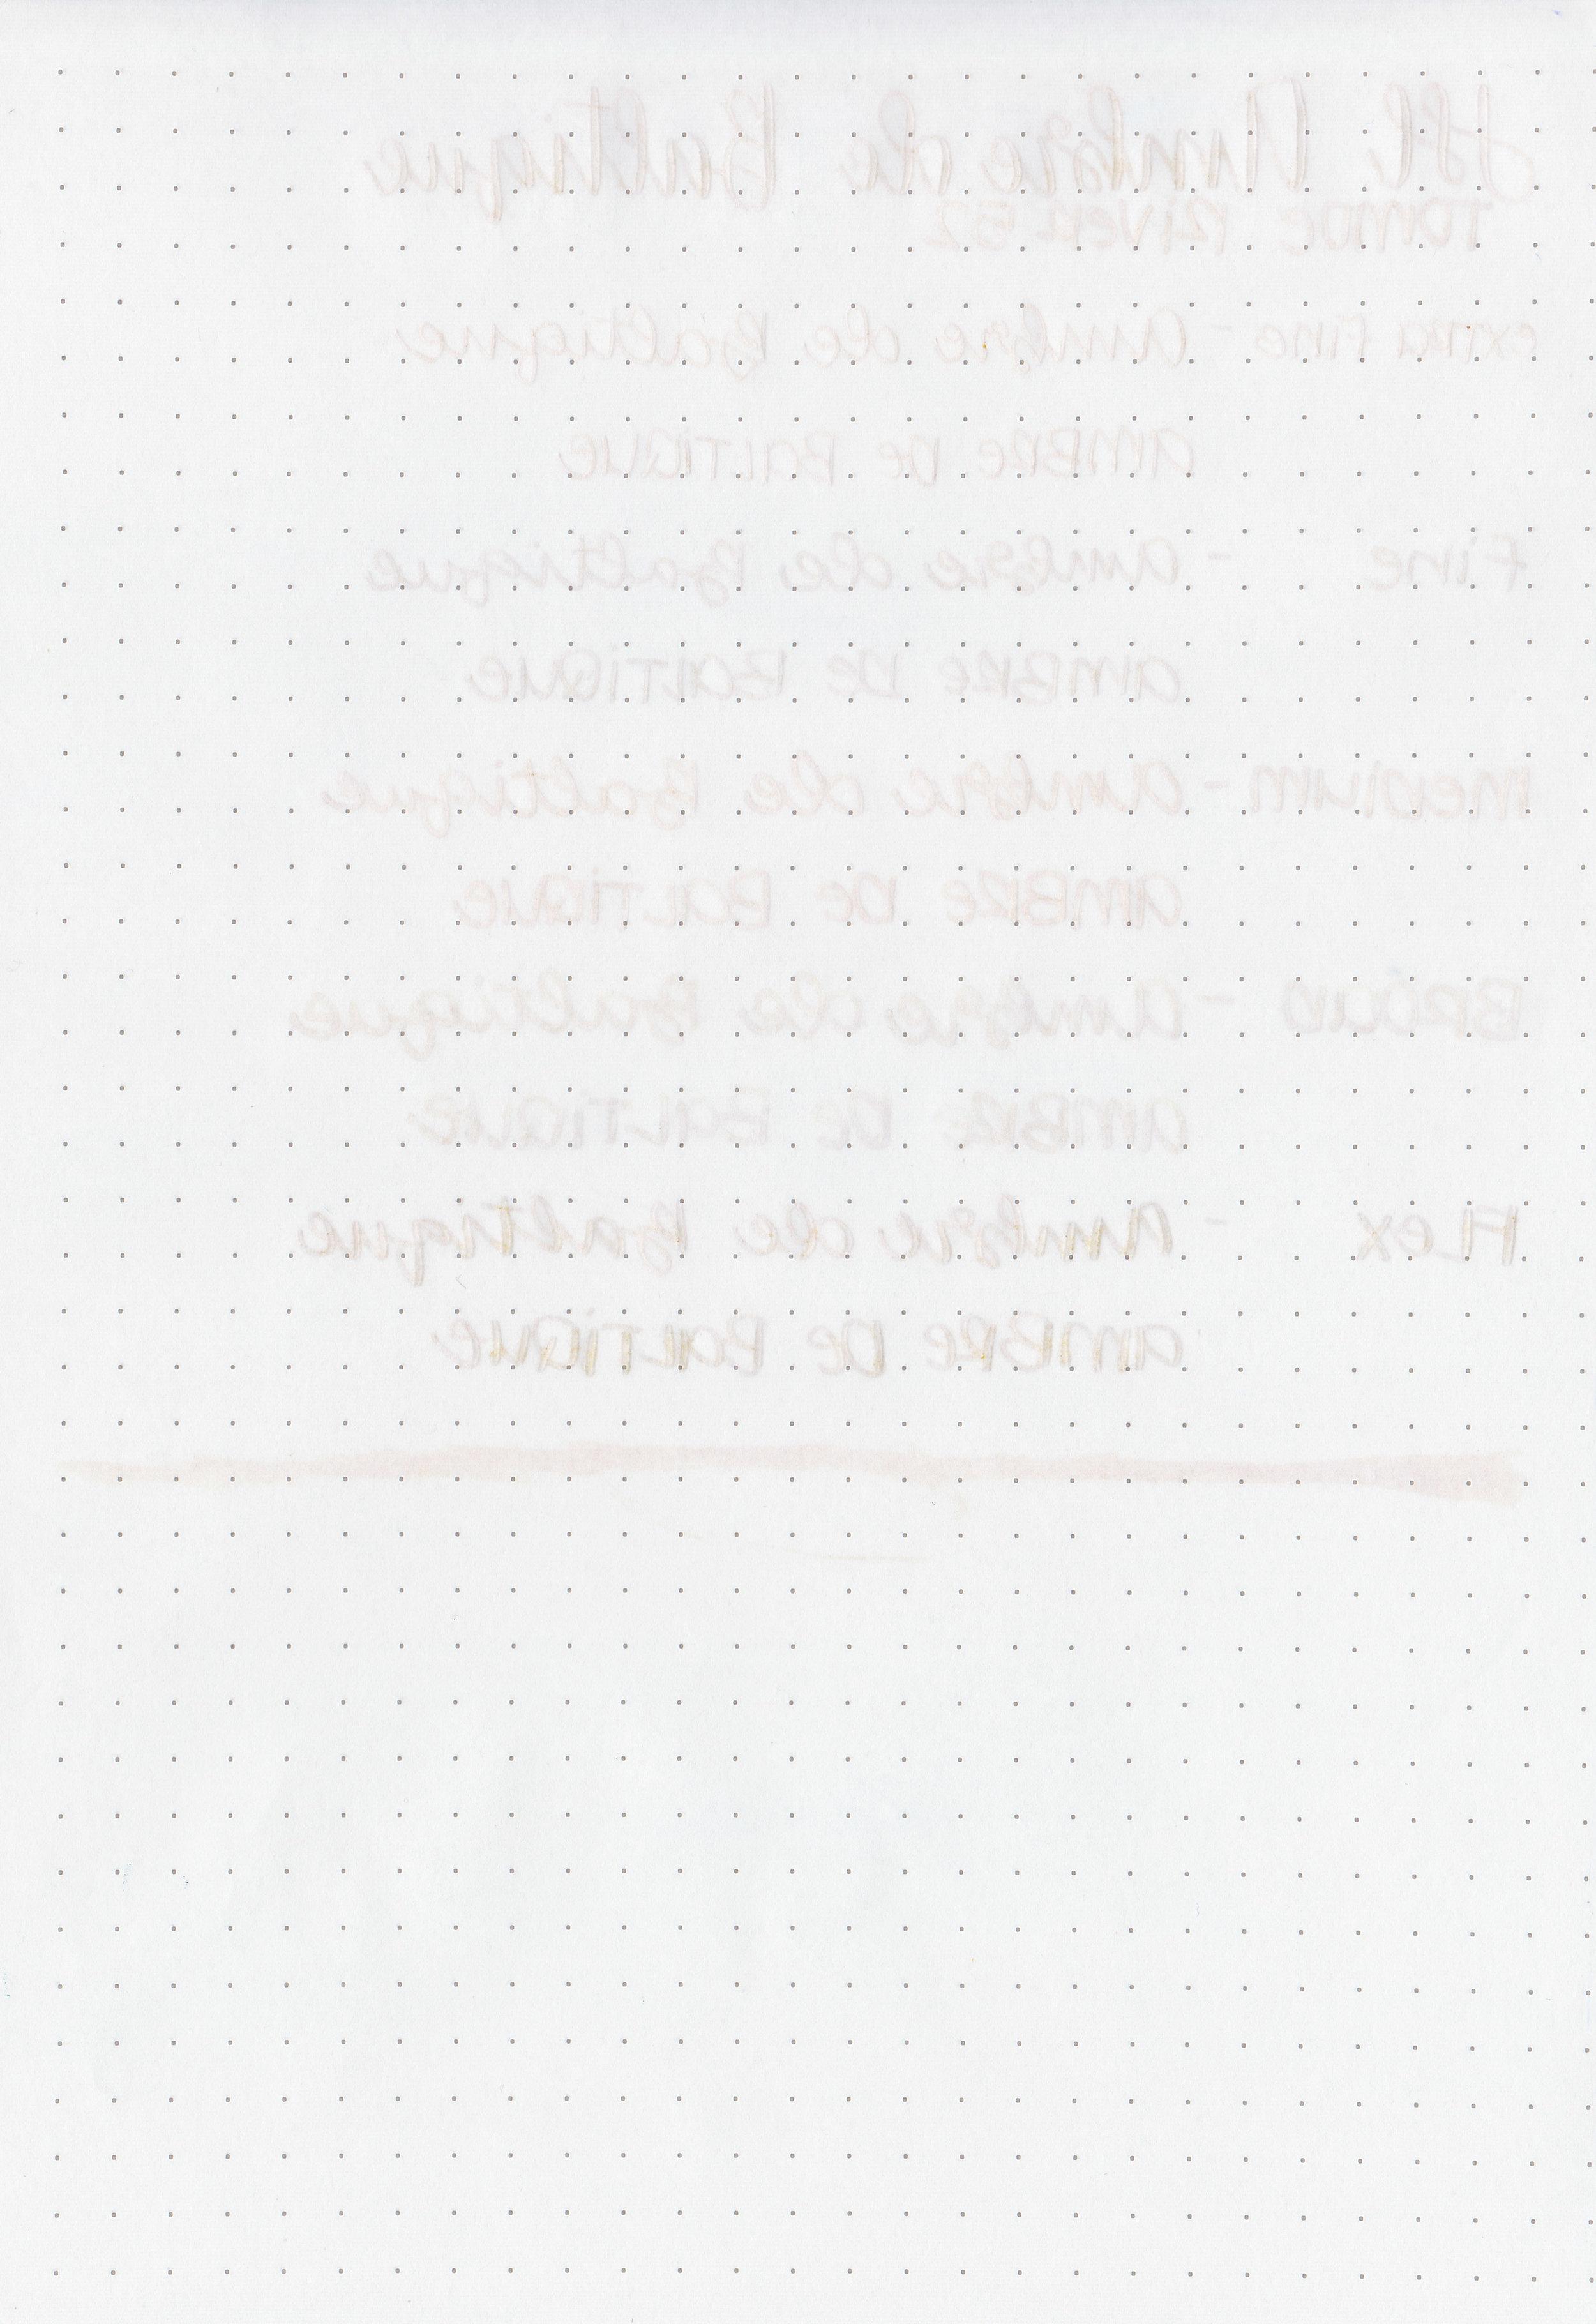 jh-ambre-de-baltique-6.jpg